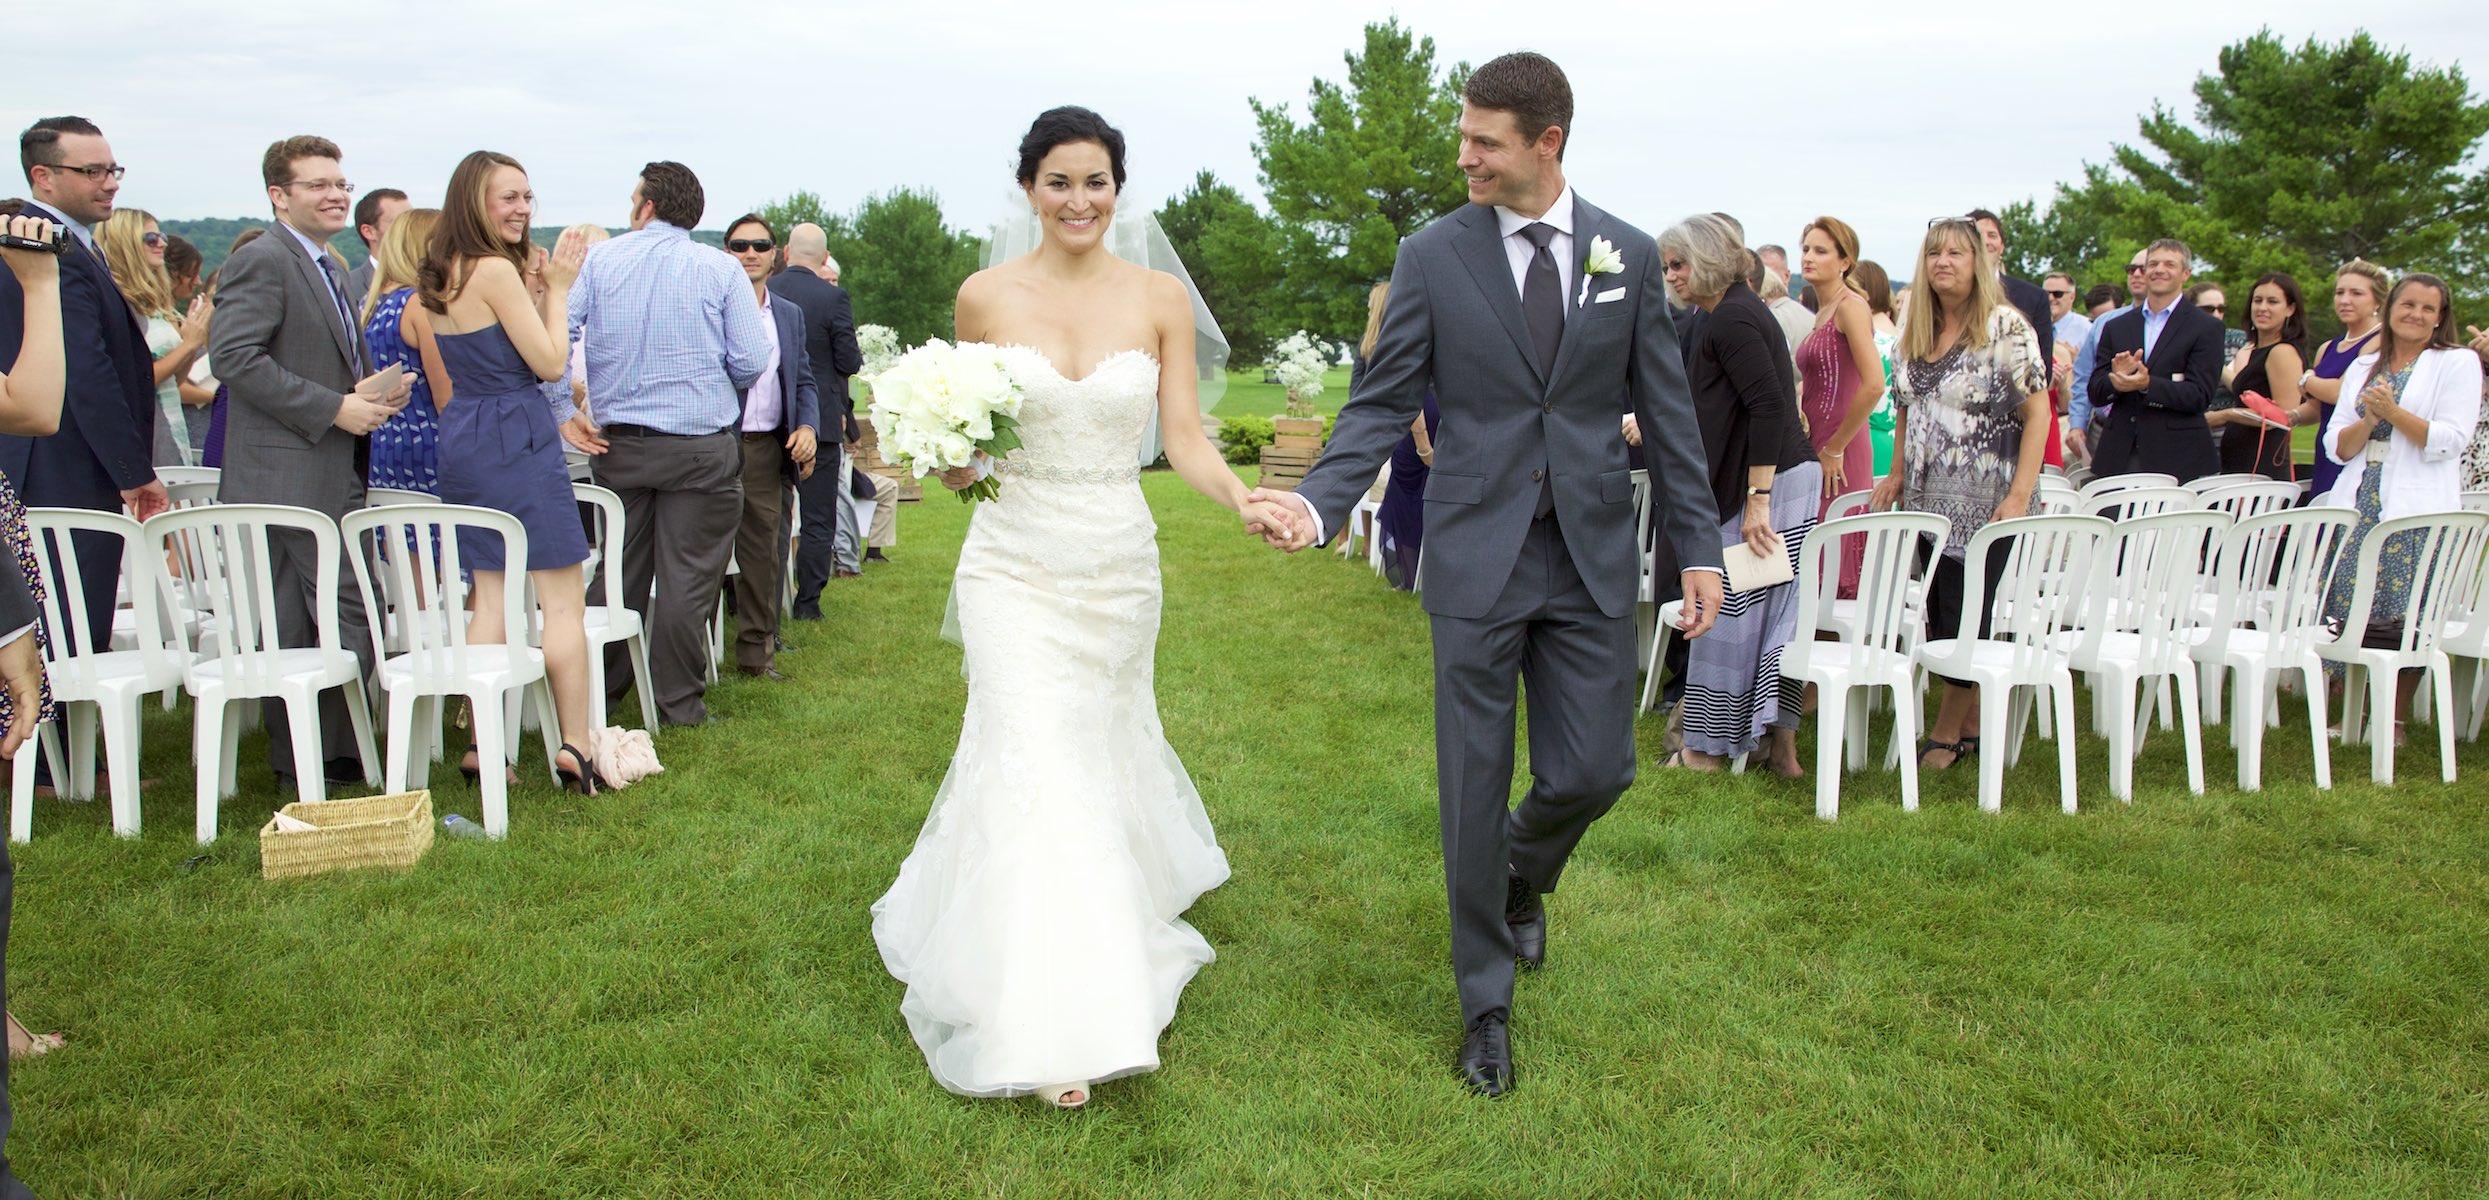 Bride and groom come down the aisle, Emi & Daniel's wedding ceremony at Geneva National Golf Club in Lake Geneva, Wisconsin. Wedding photography by Steve & Tiffany Warmowski.